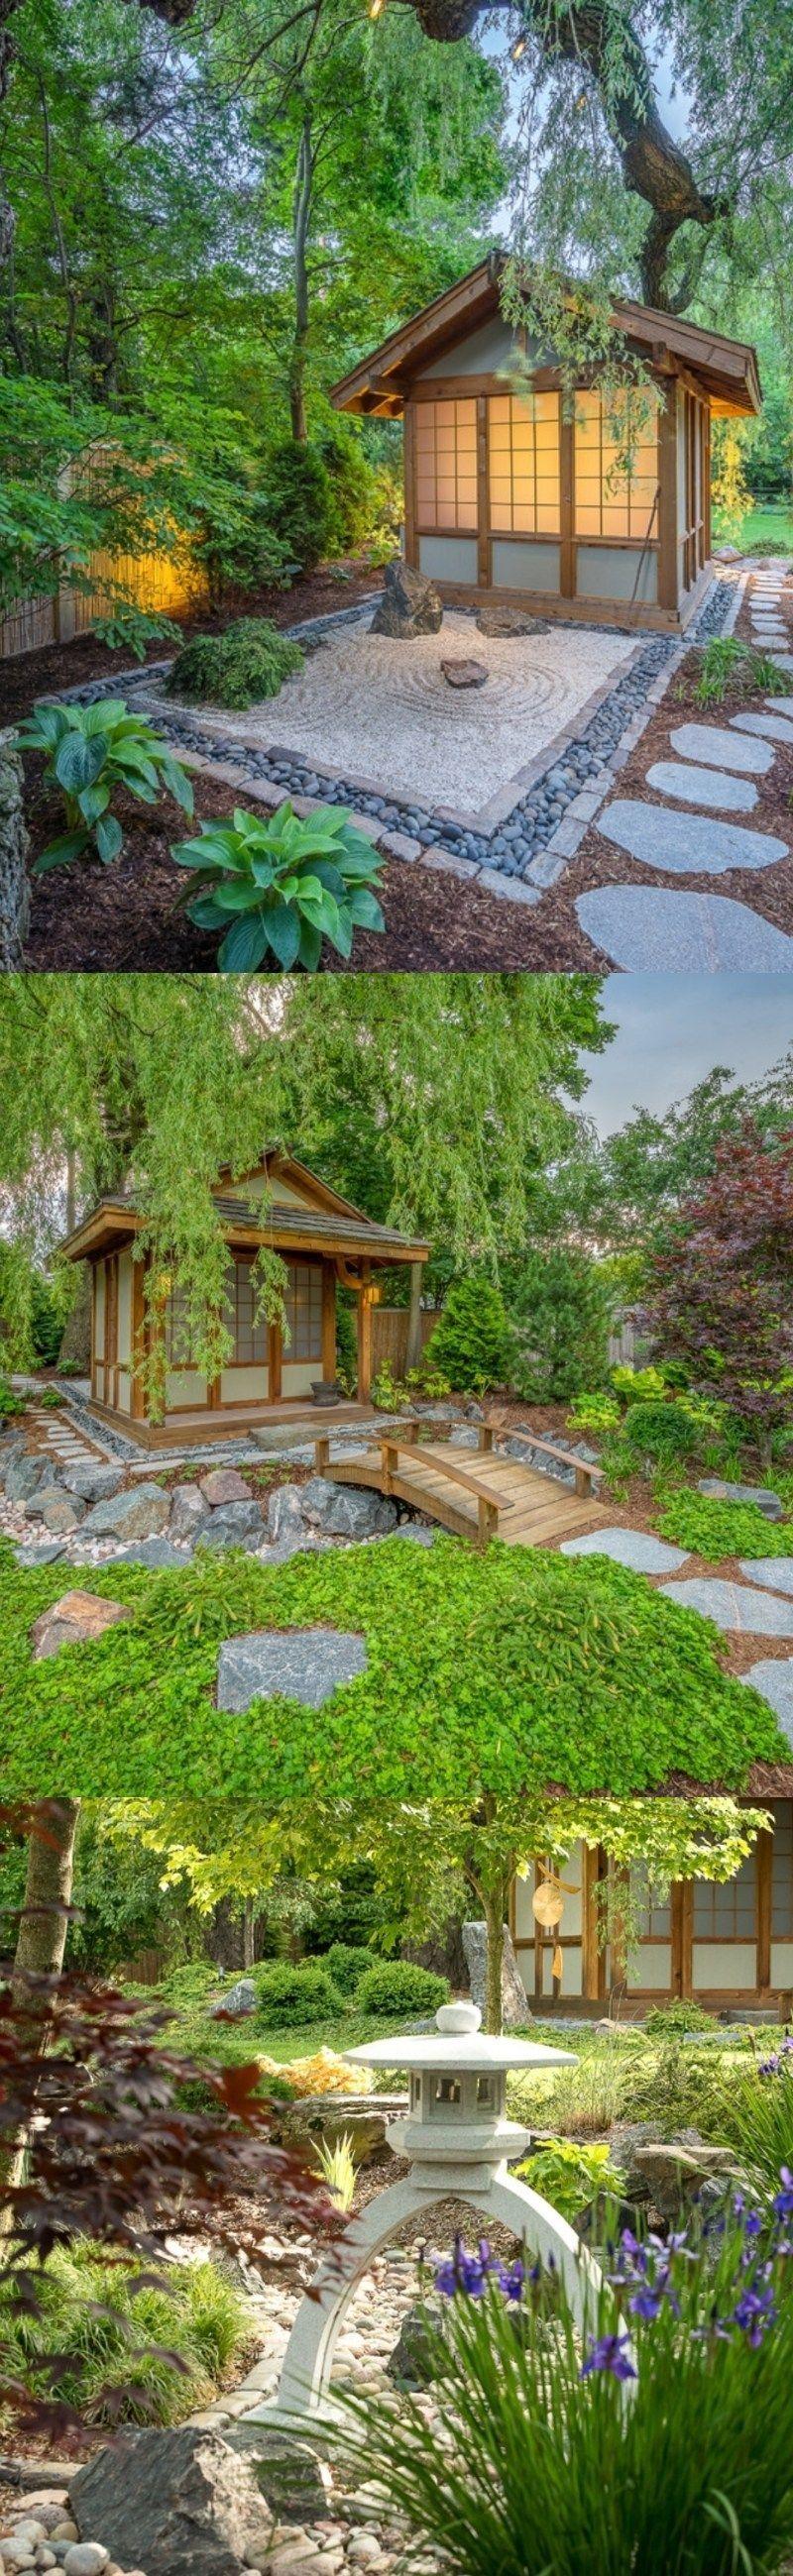 21+ Zen Garden Ideas 2019 (How to Build Zen Garden ...